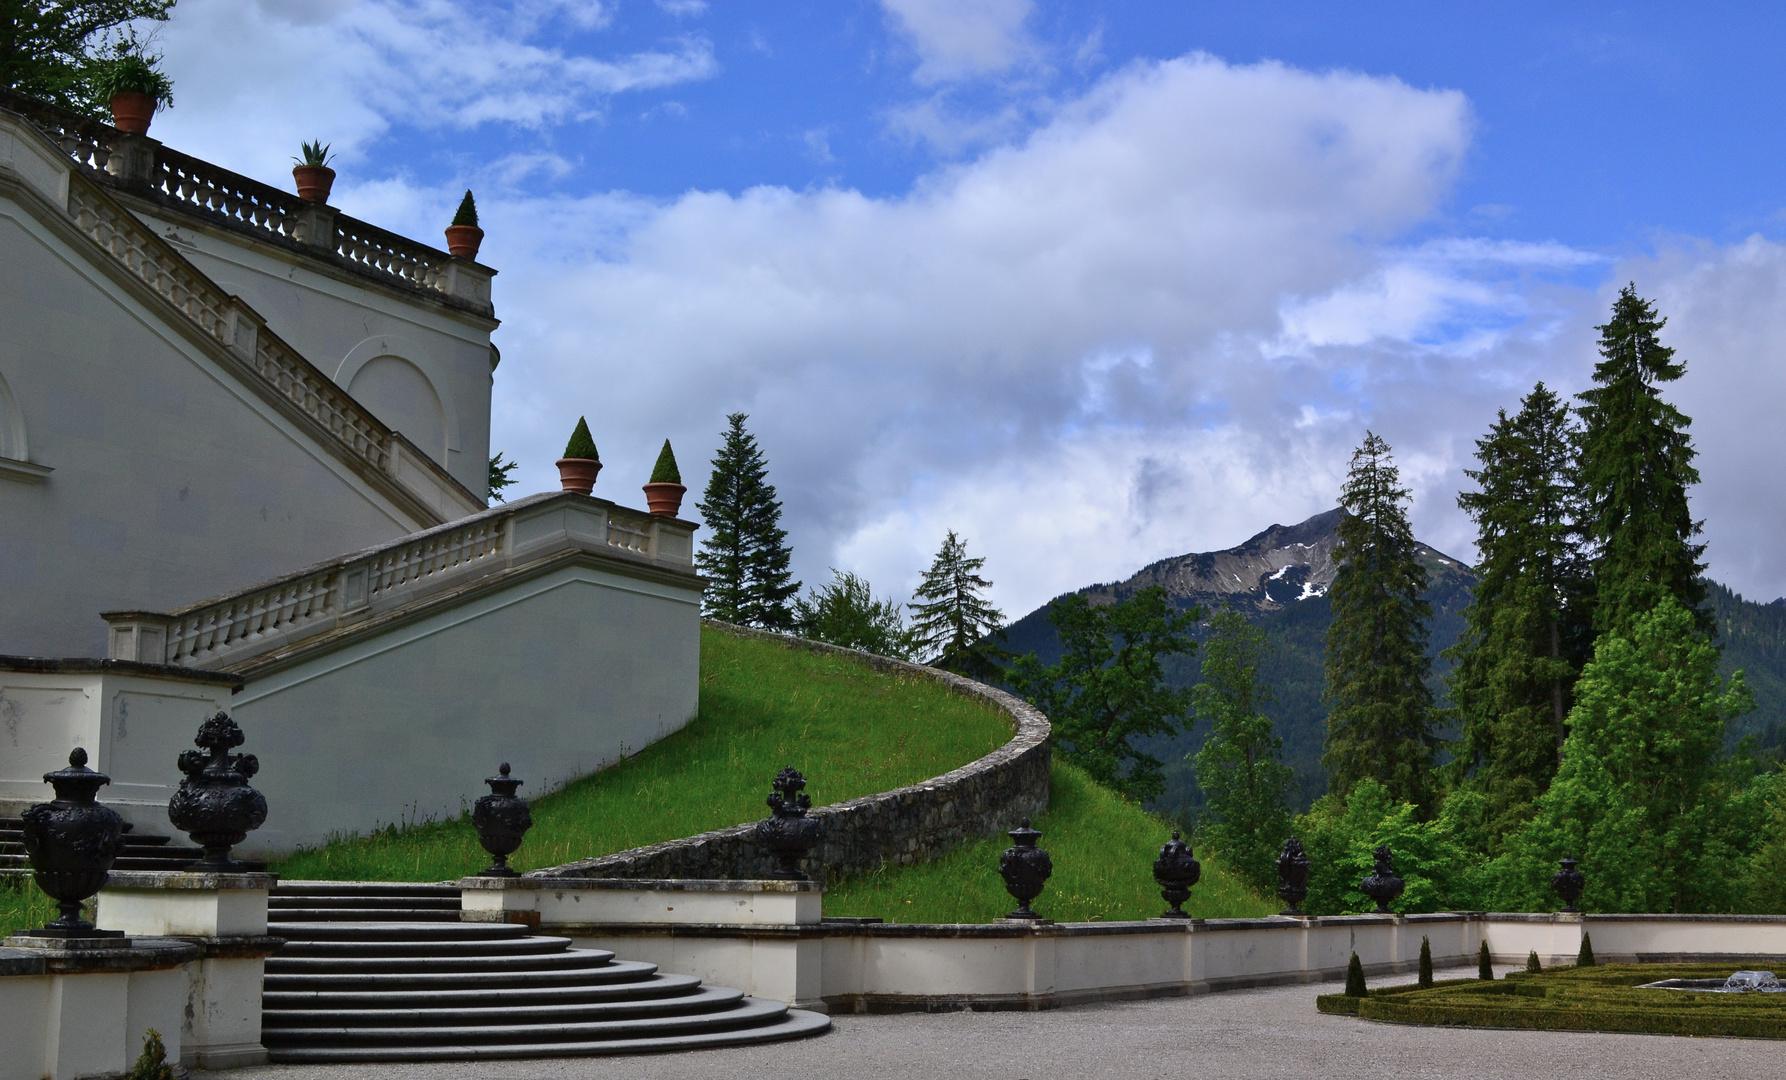 Besuch im Schloss Linderhof (3)